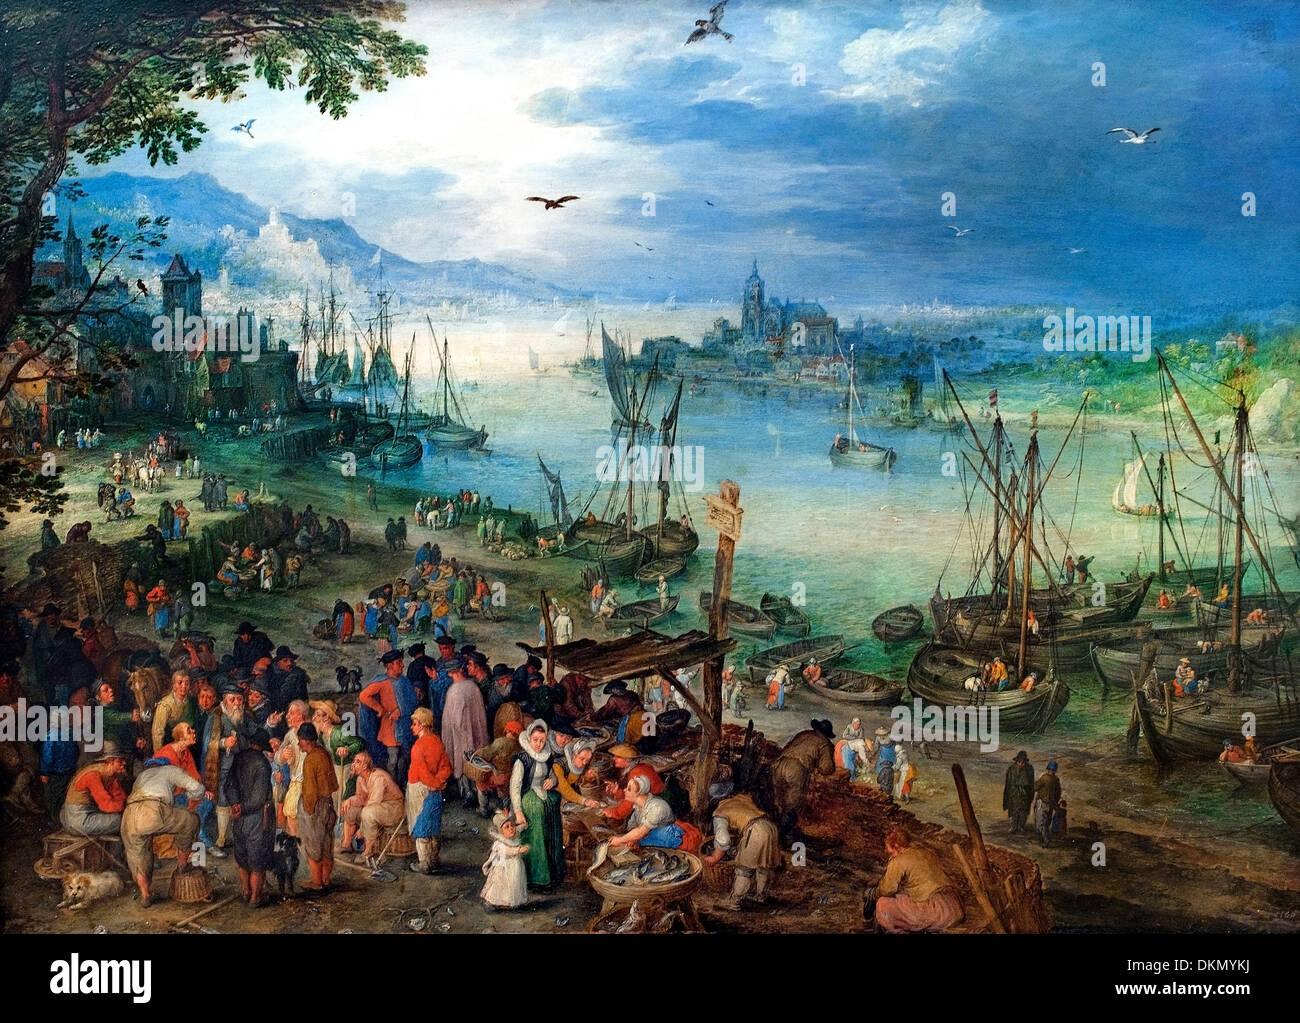 Fischmarkt am Ufer eines Flusses - Fish market on the banks of a river Jan Brueghel the Elder 1568–1625  Flemish Belgian Belgium - Stock Image